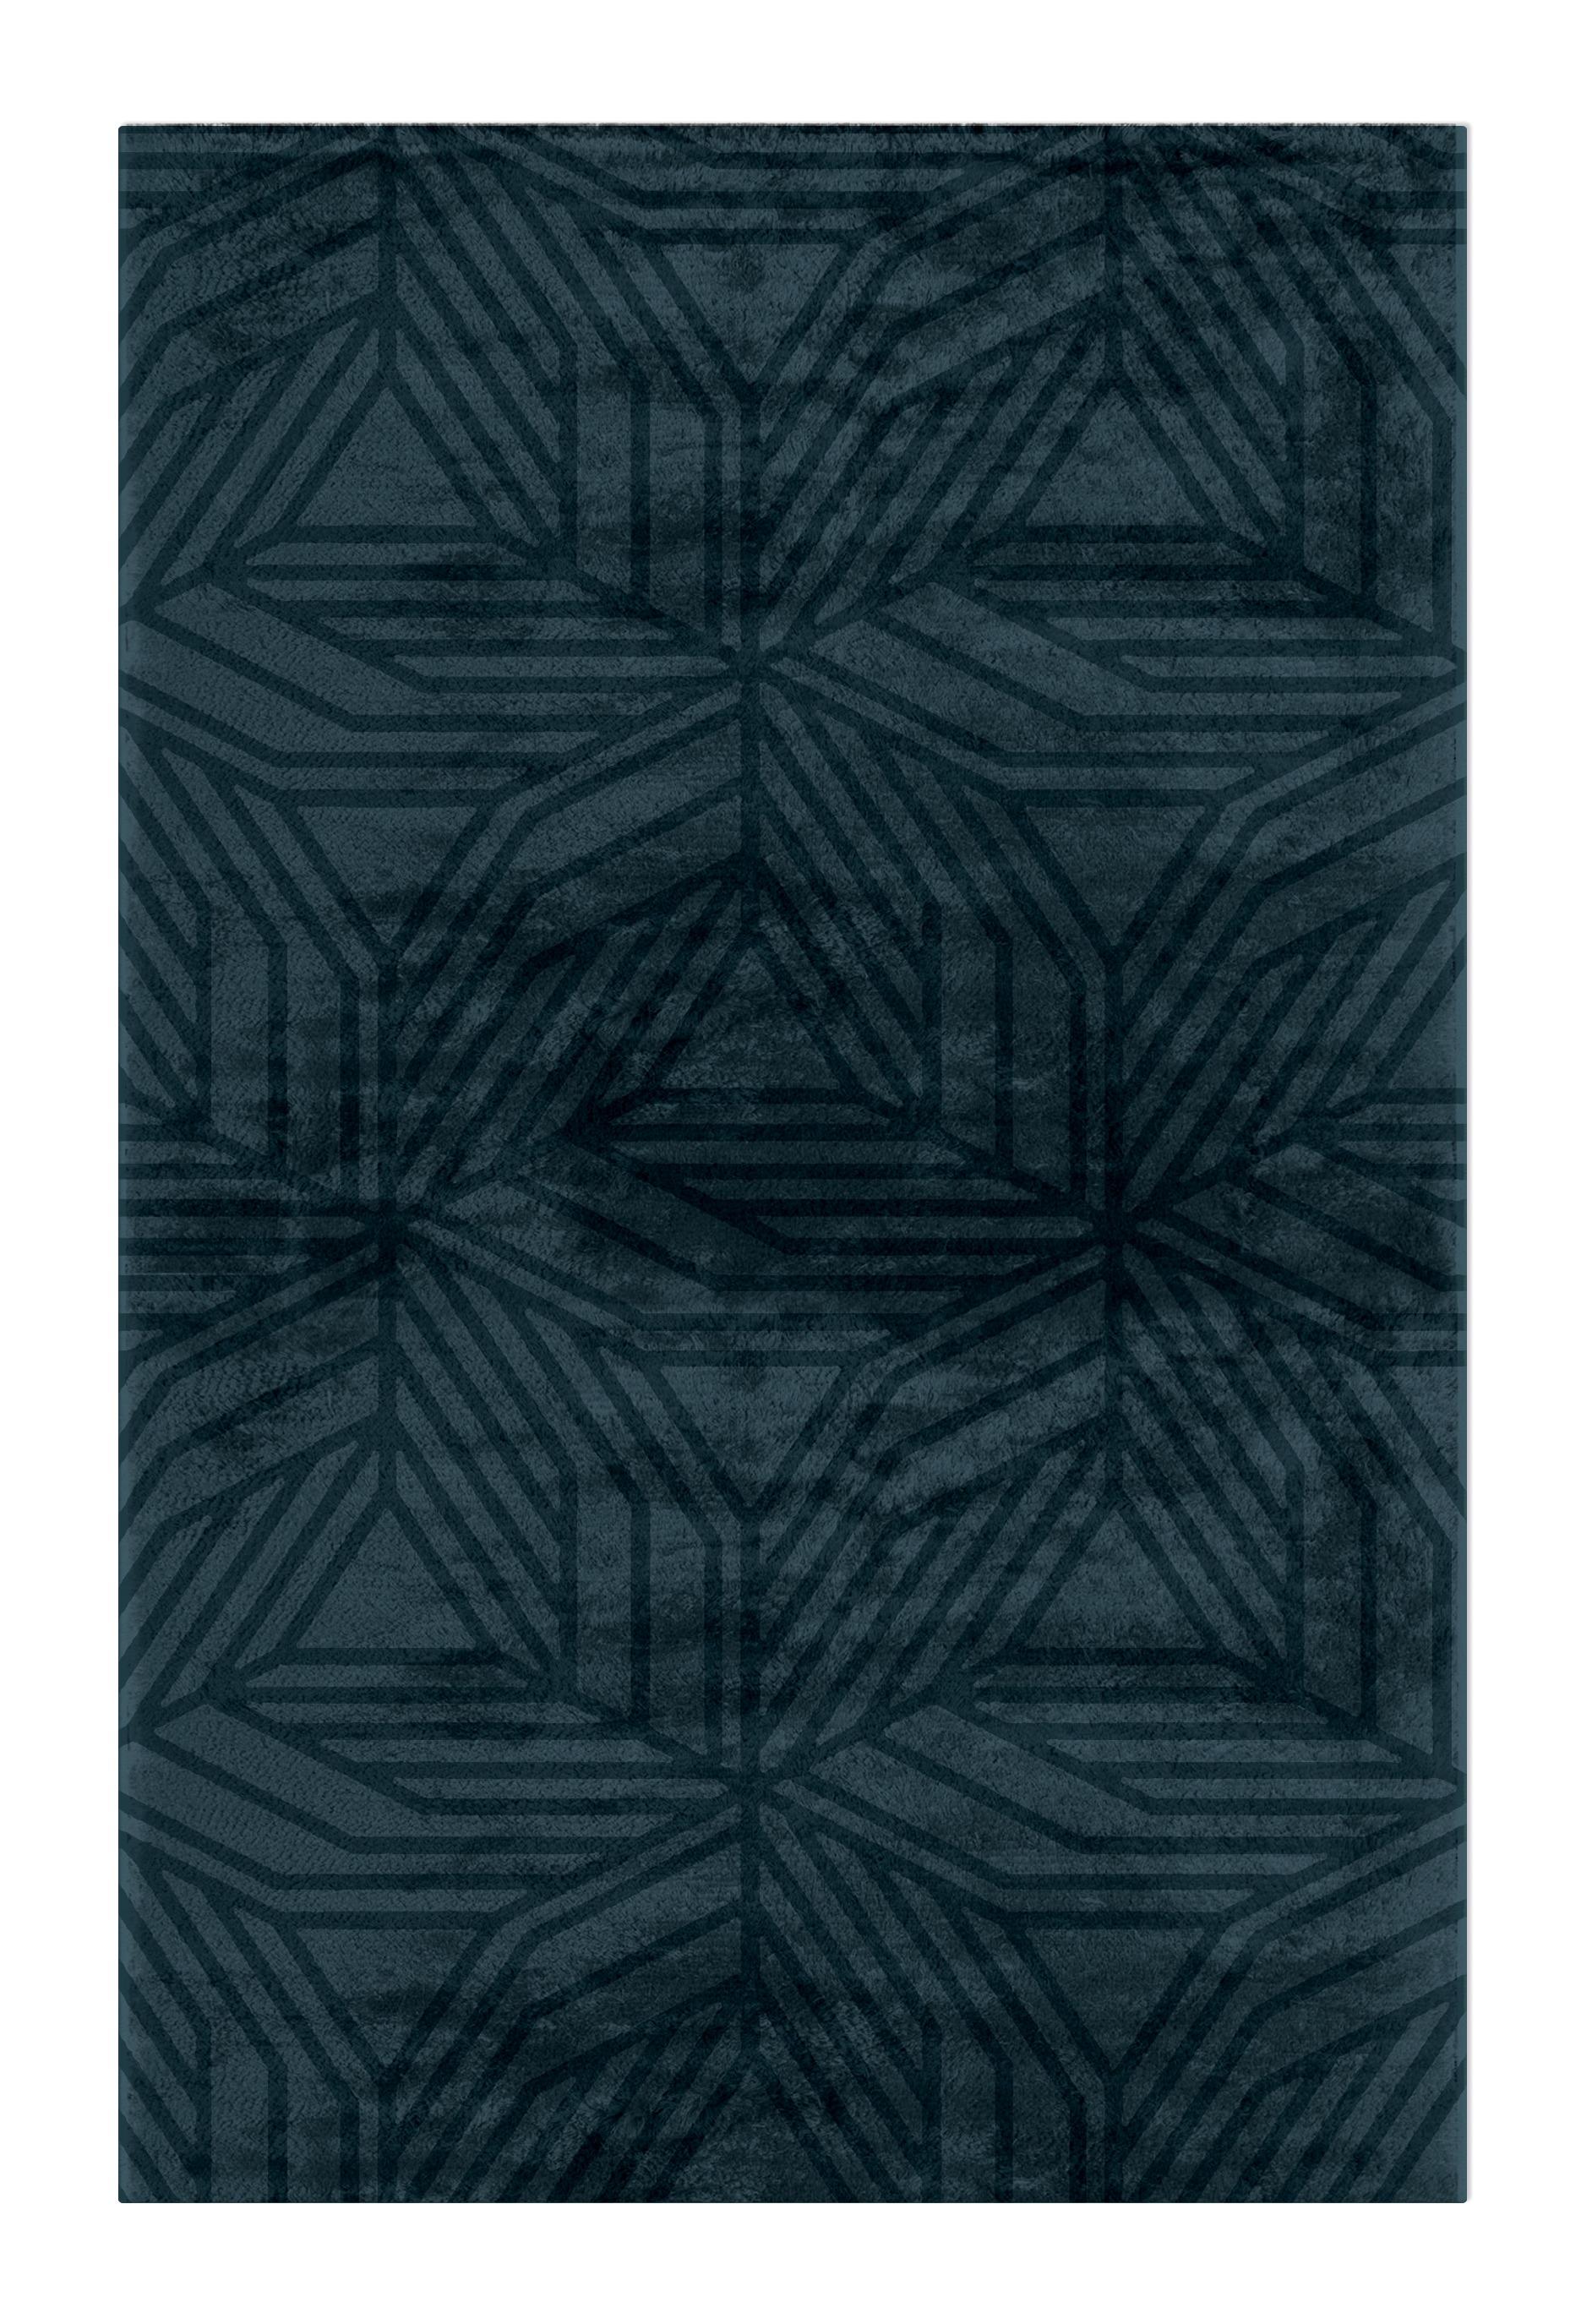 Geometric Rugs - The Power of 20th-century Avant-Garde Expression geometric rugs Geometric Rugs – The Power of 20th-century Avant-Garde Expression kaiwa rug geometric rugs